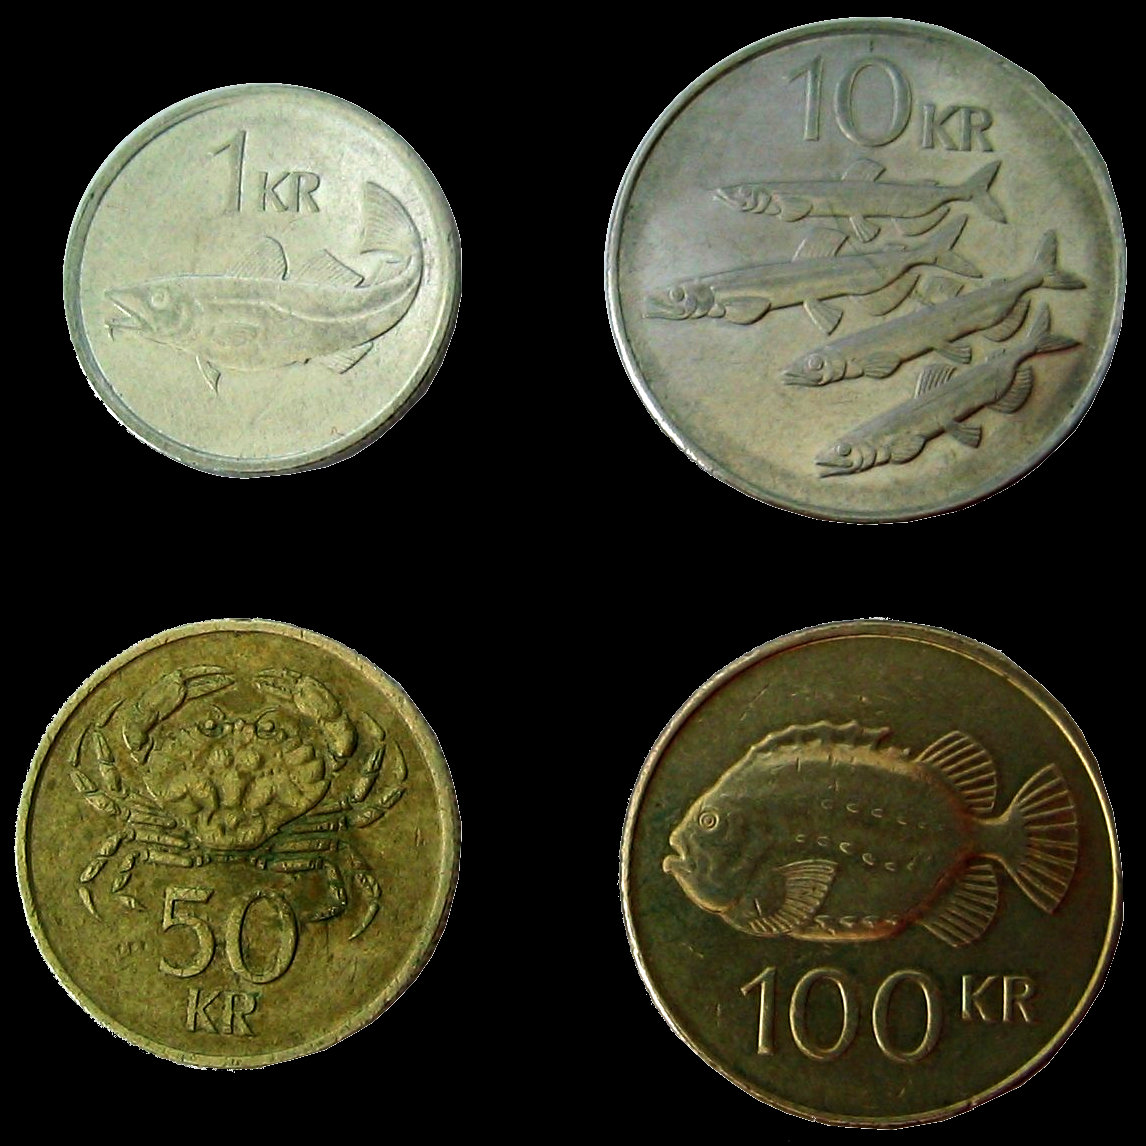 krona dollar